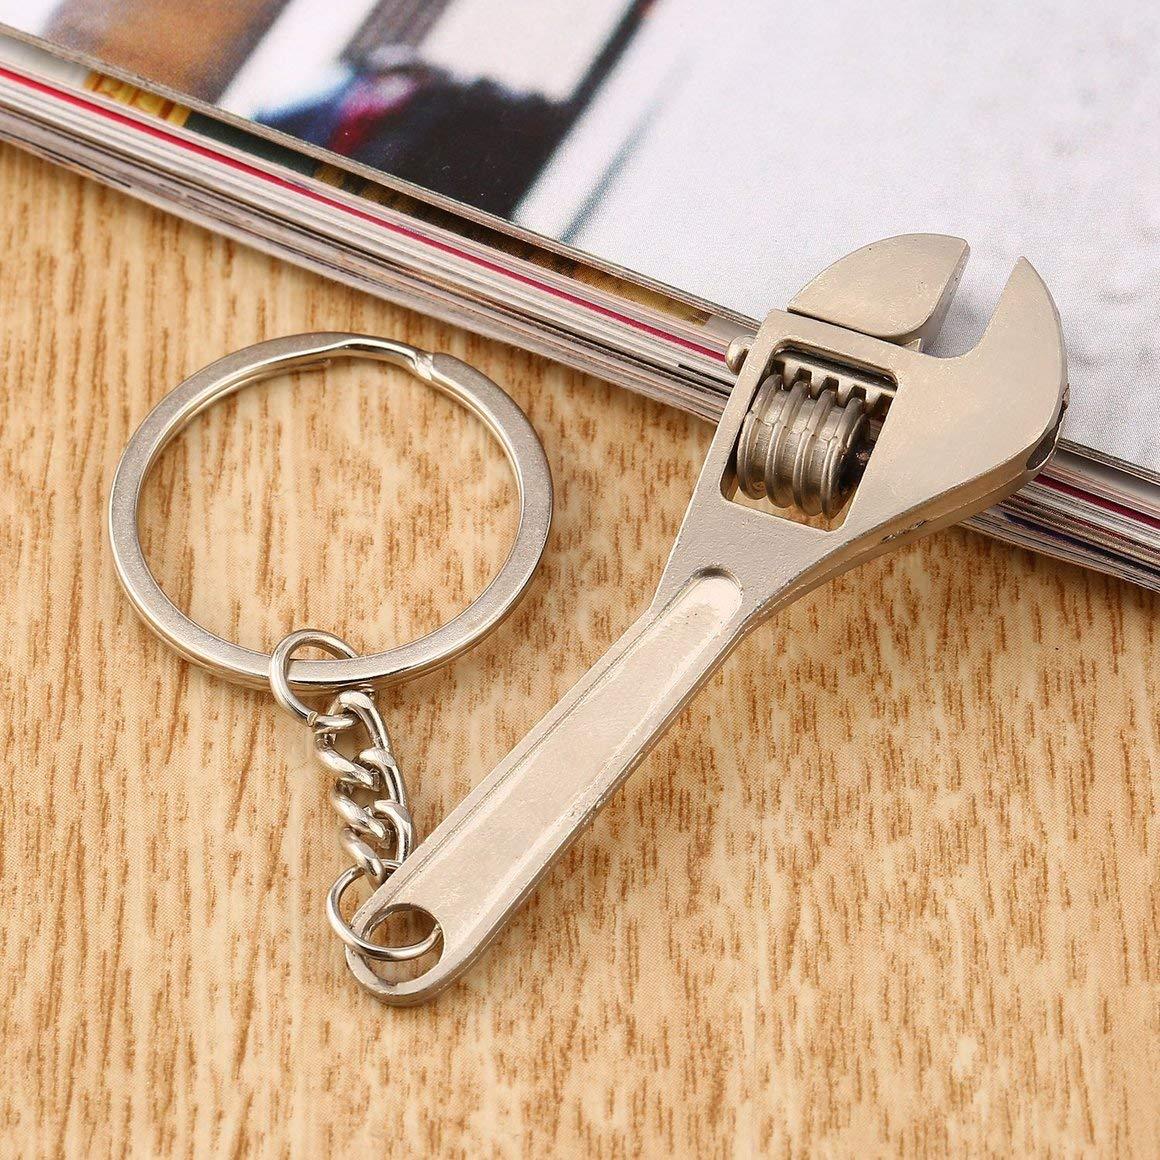 Silver Funnyrunstore Multifunctional Mini Metal Adjustable Creative Tool Wrench Spanner Key Chain Ring Keyring Adjustable Pocket Tools